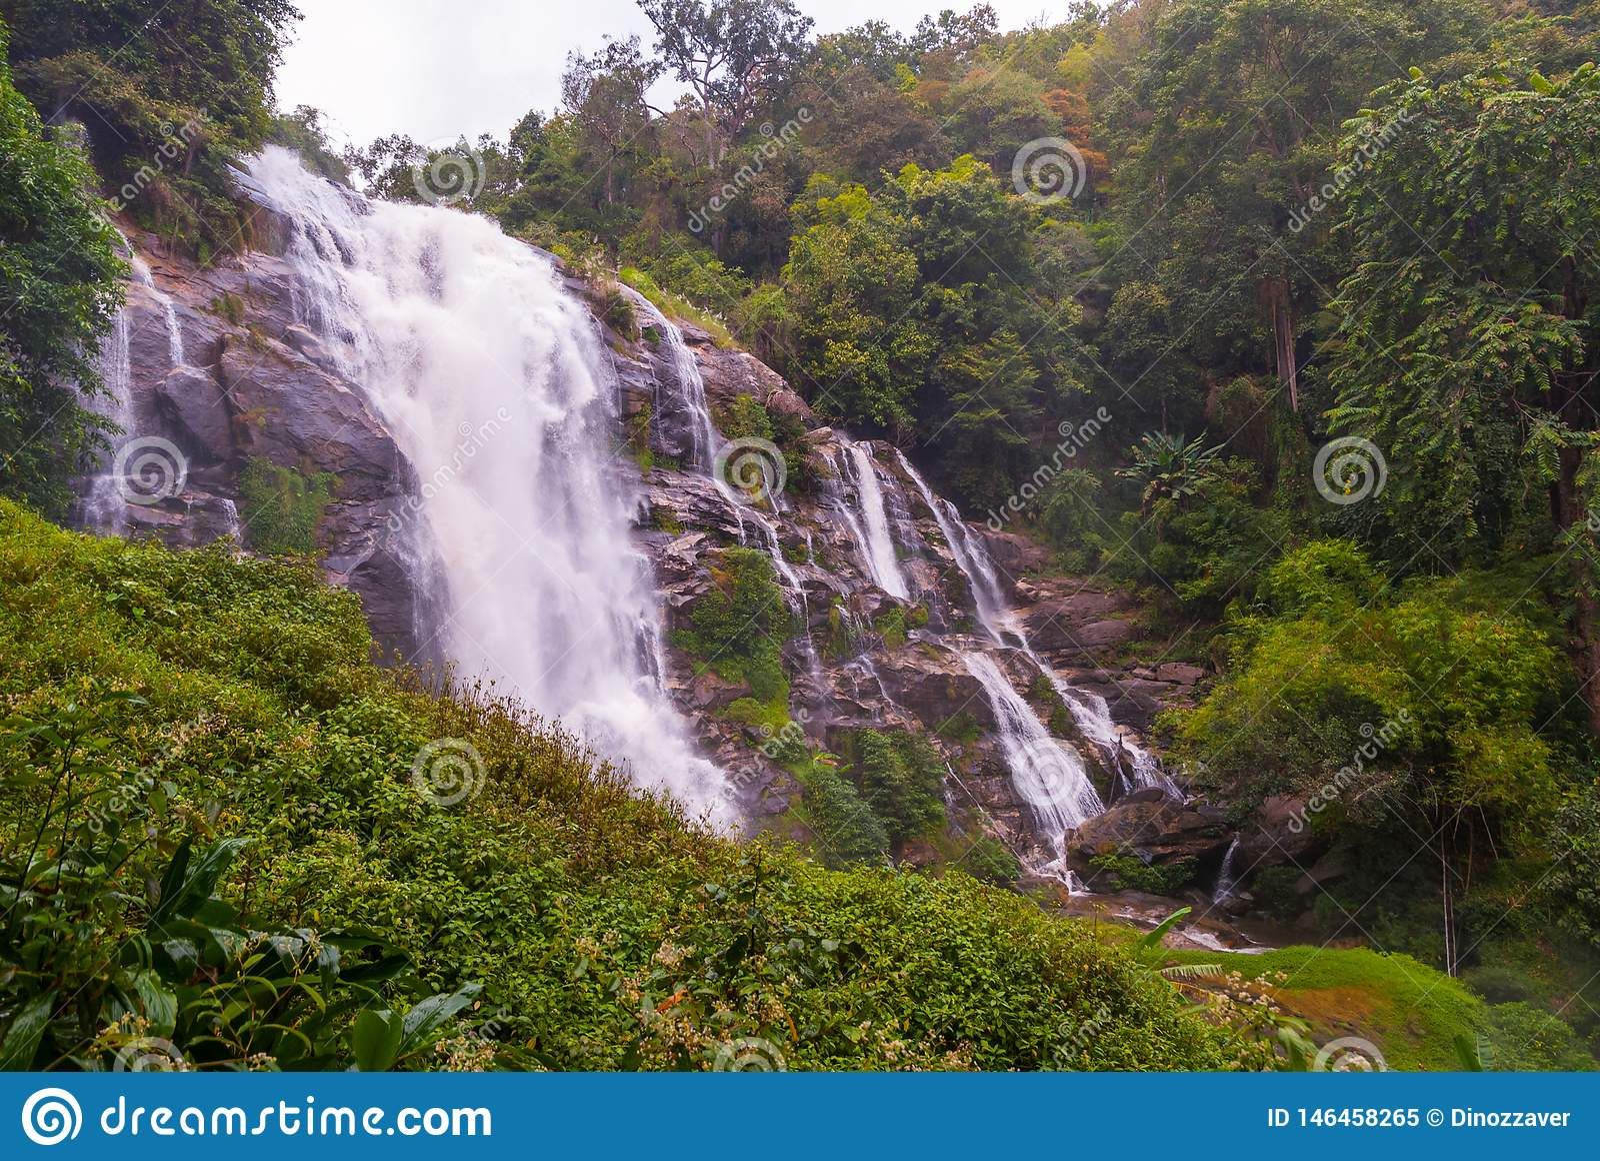 Wachirathan-Wasserfall, Thailand